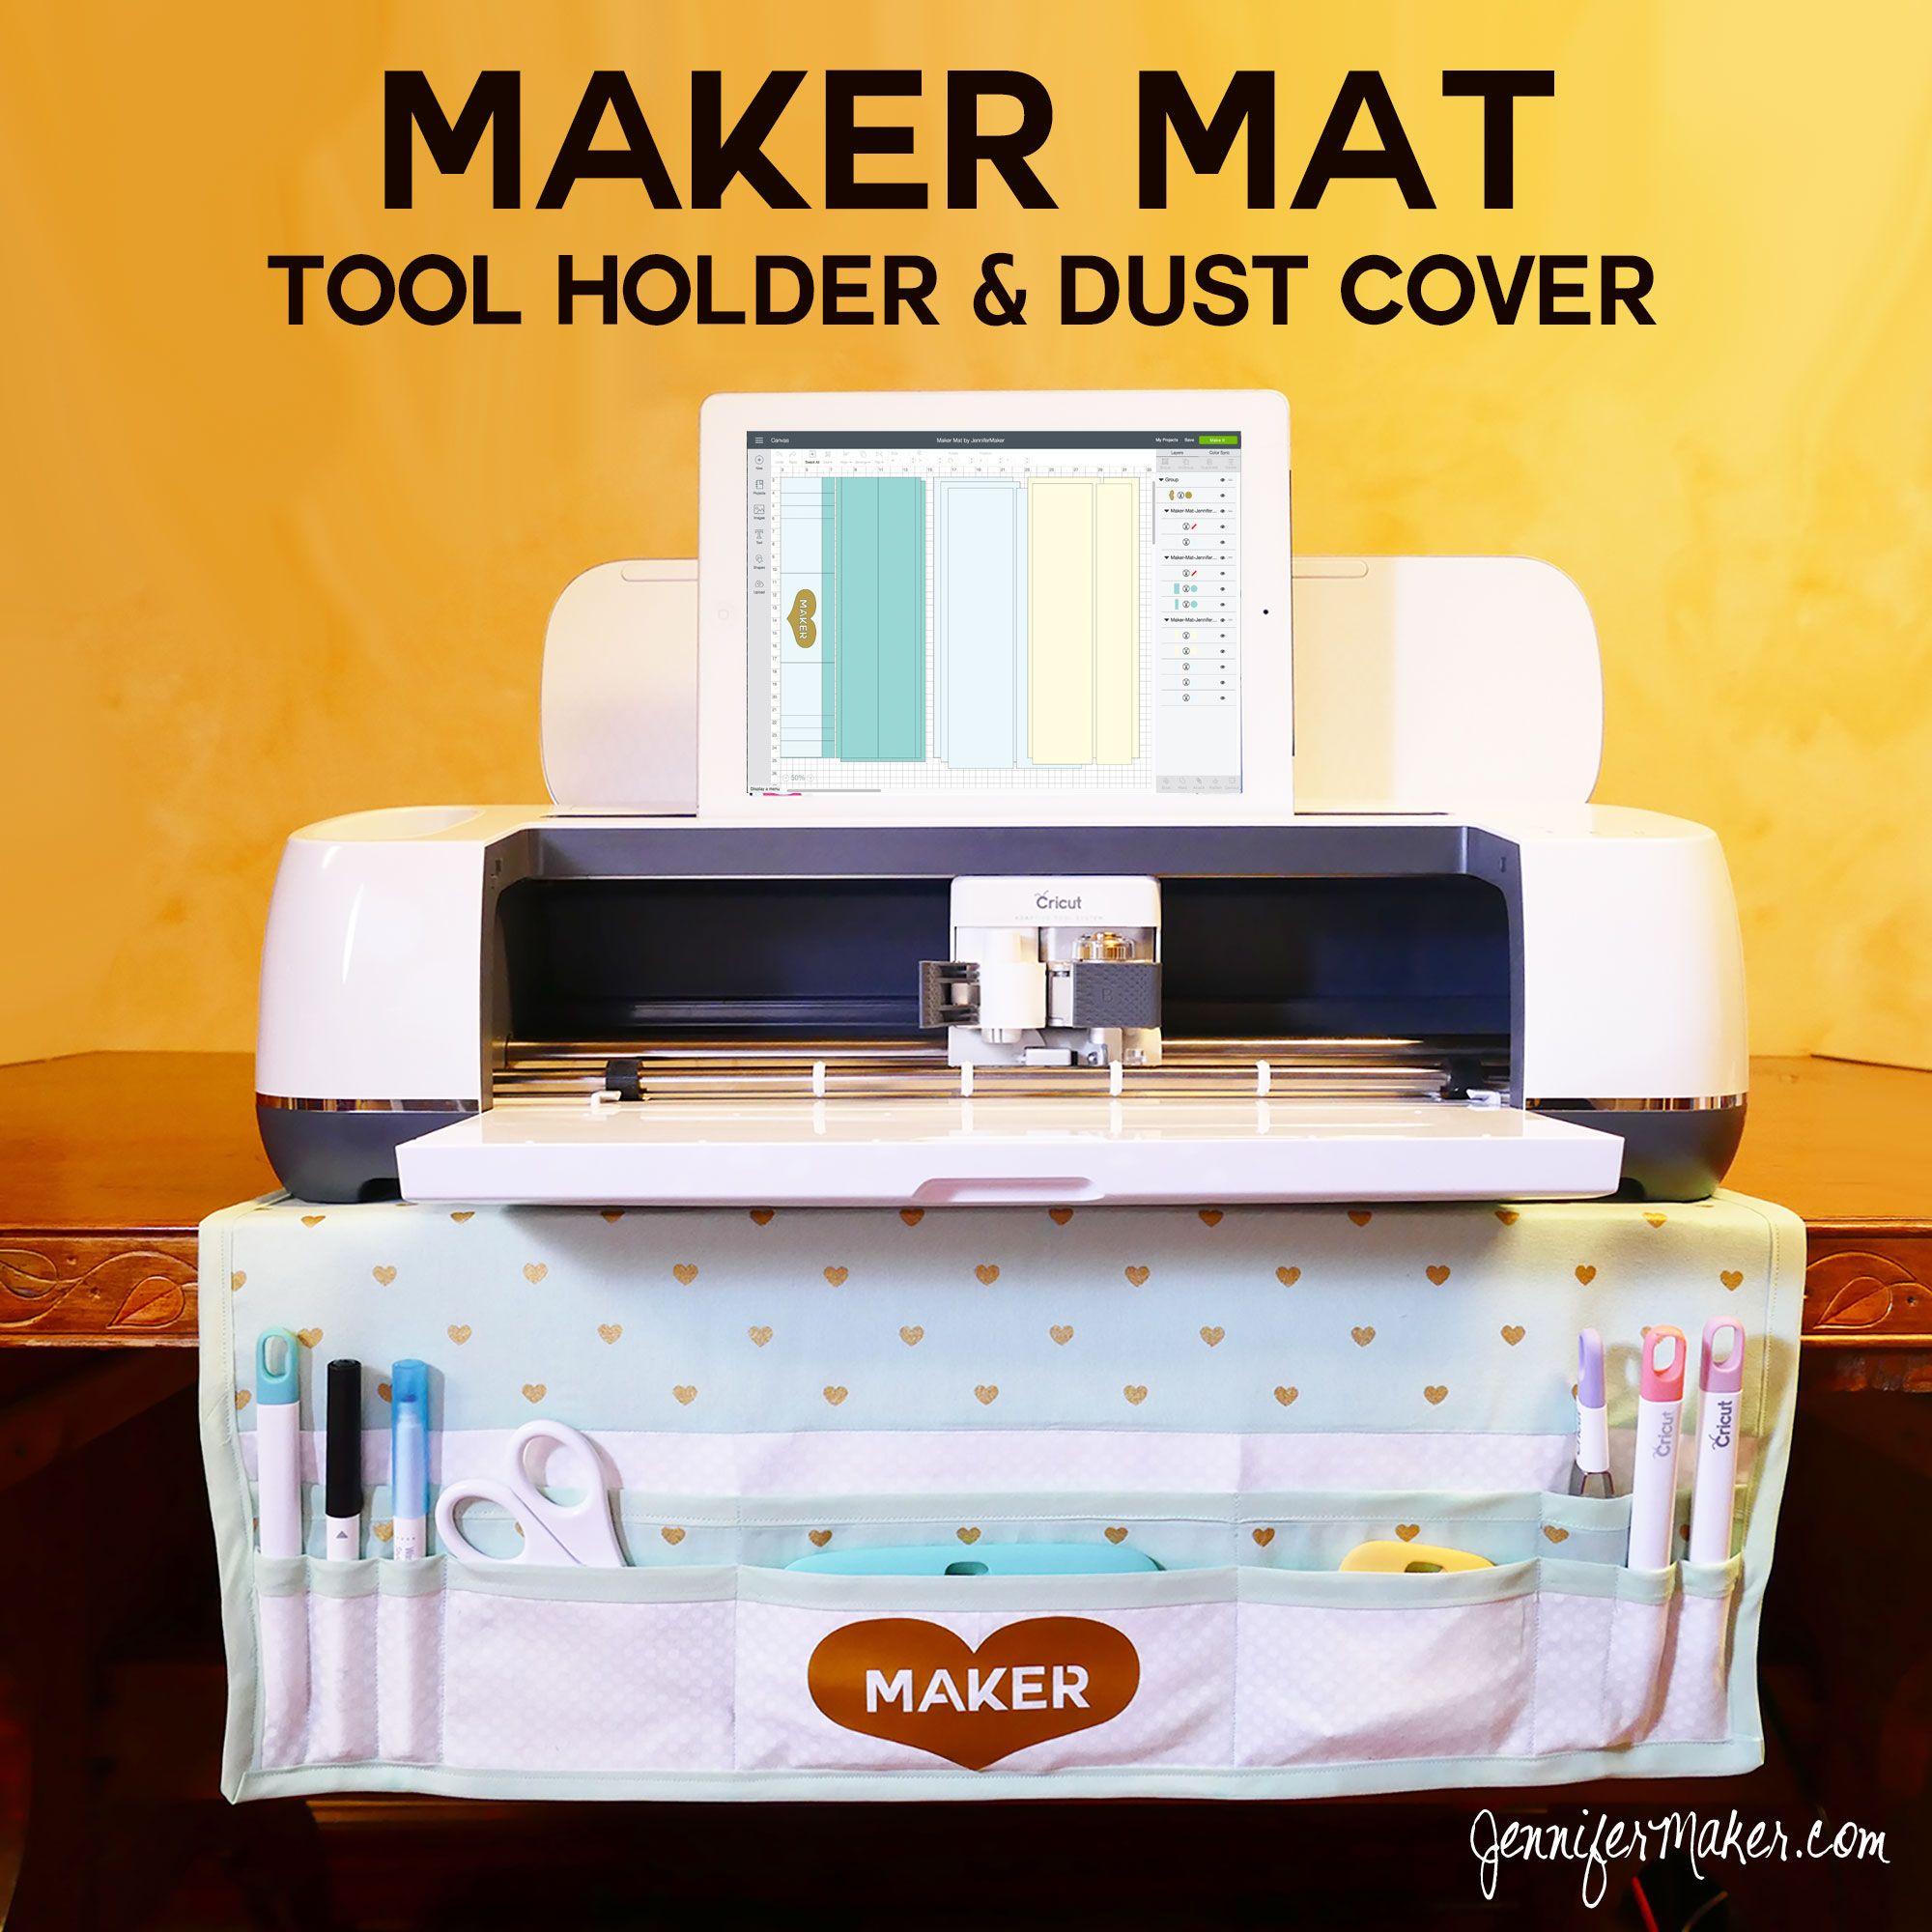 My Cricut Maker Mat Organizer Dust Cover In One Jennifer Maker Diy Cricut Cricut Craft Room Cricut